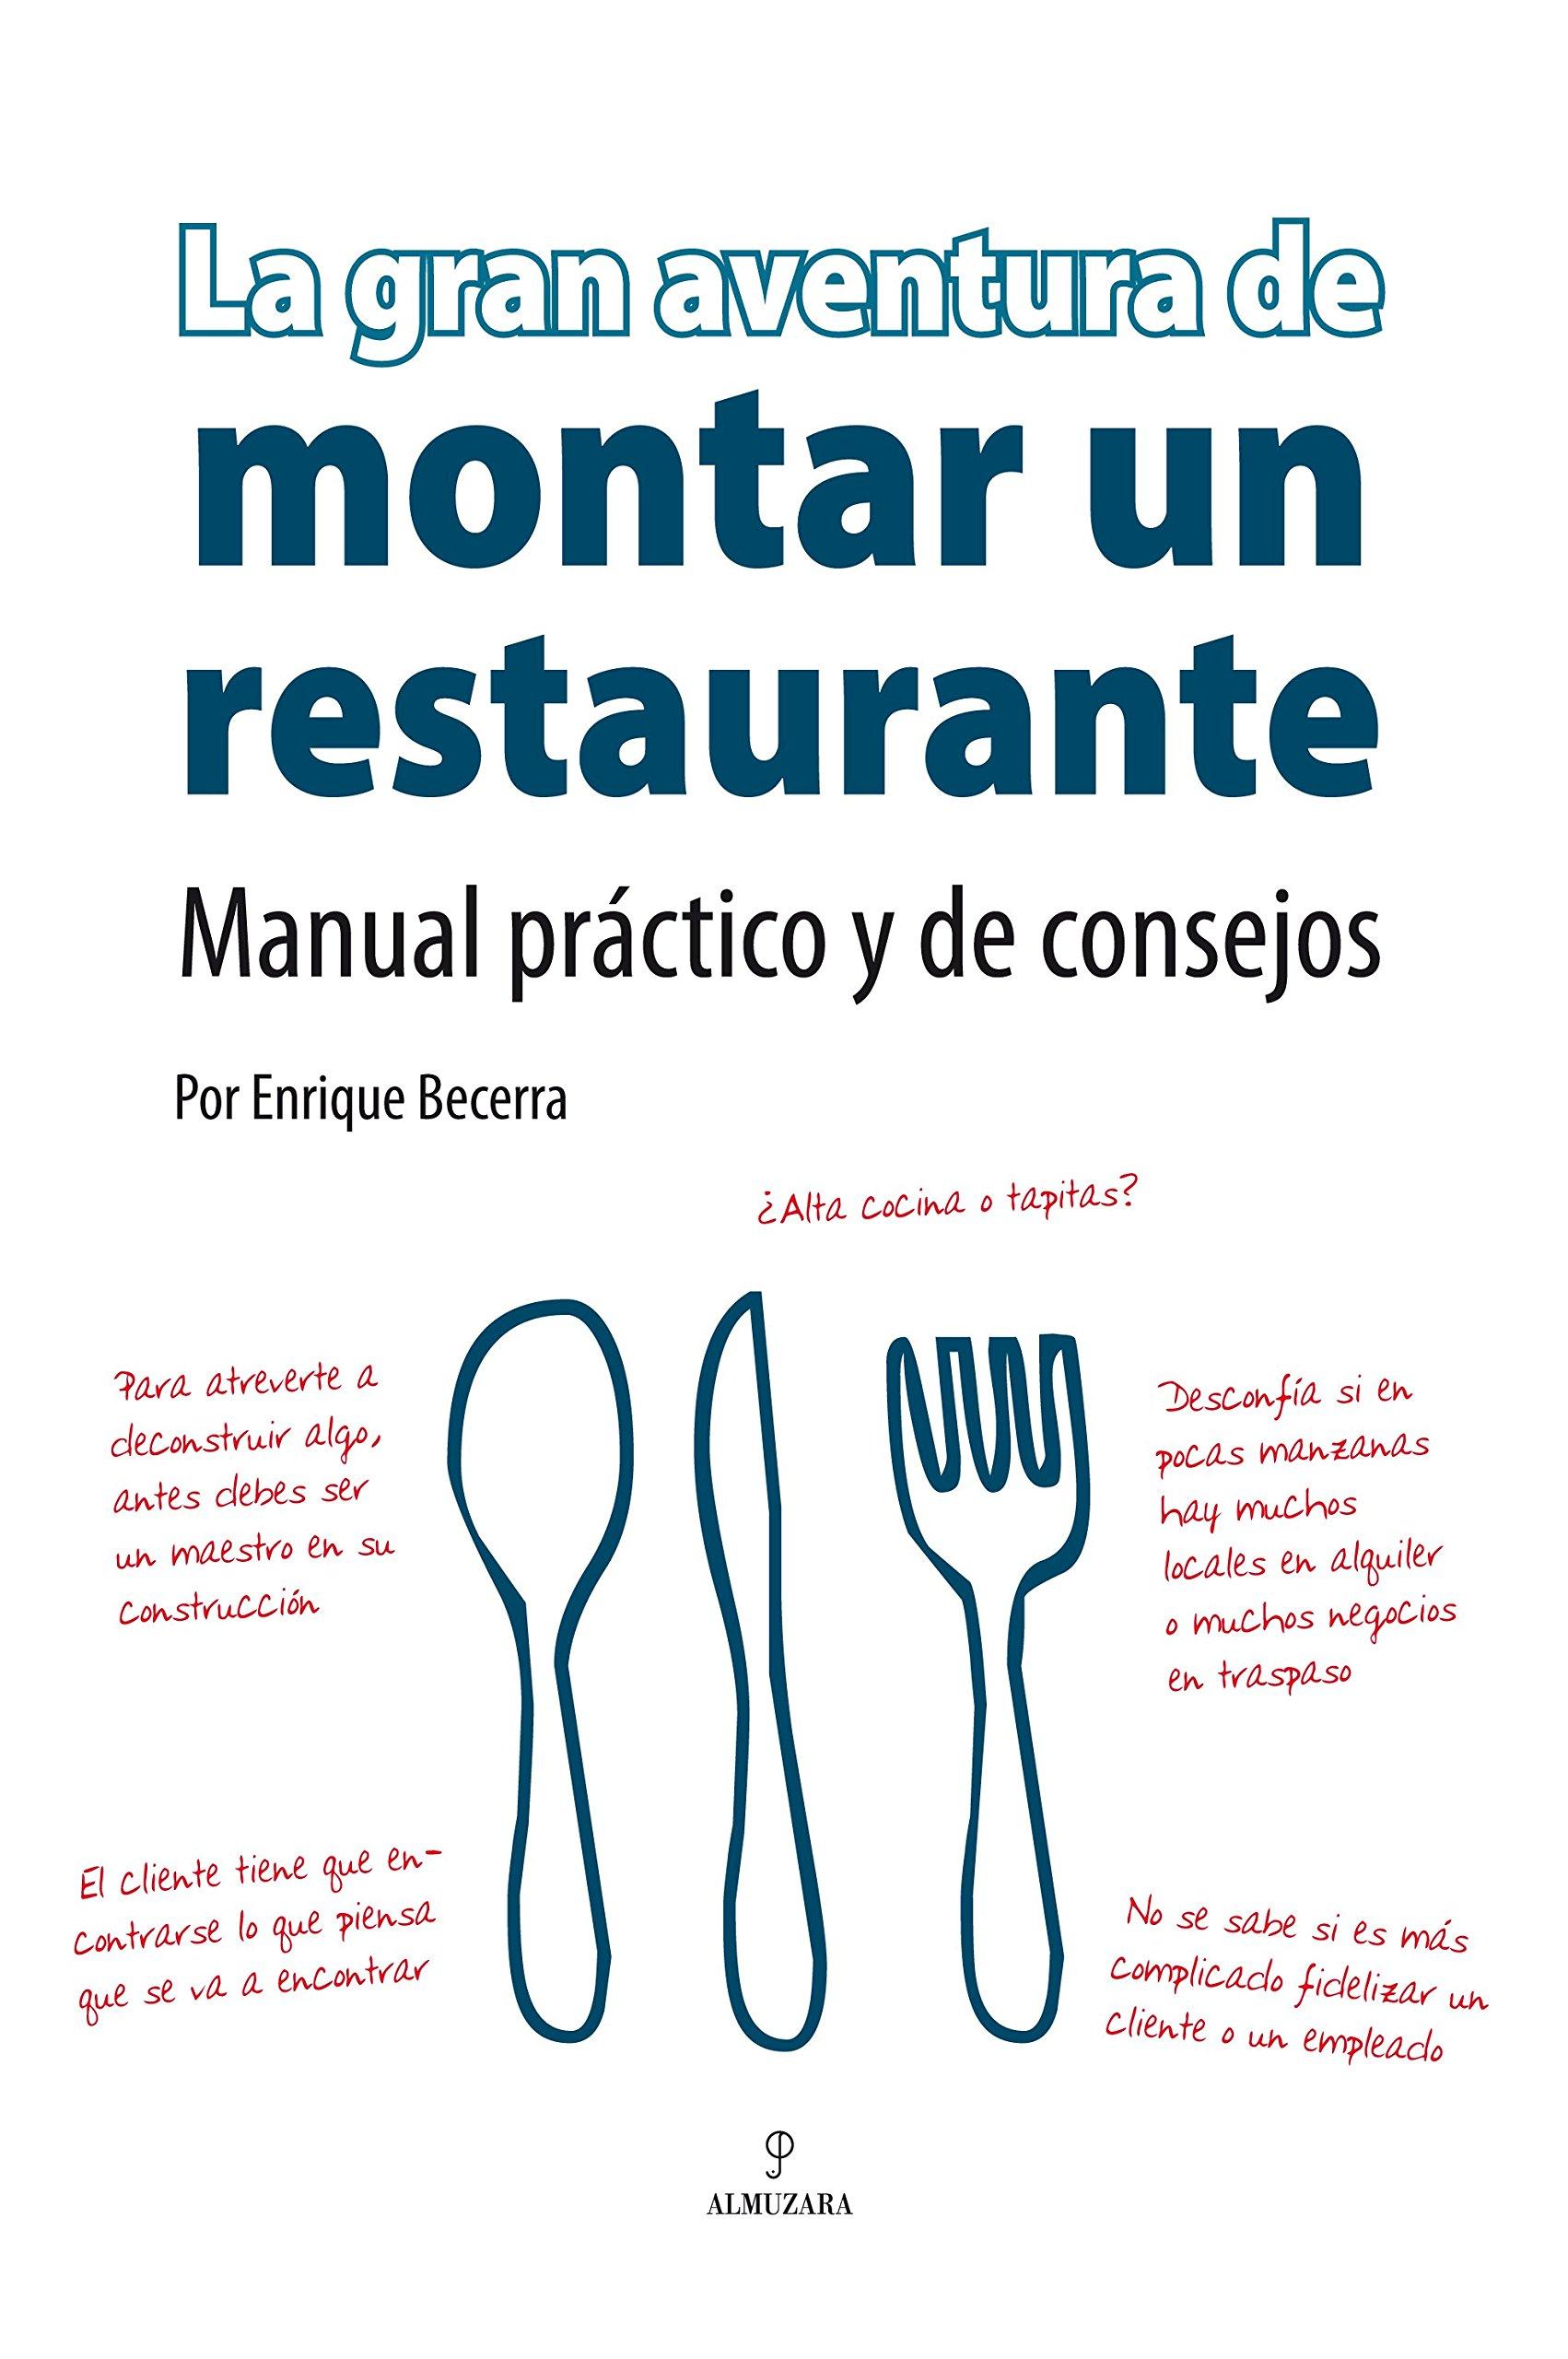 La gran aventura de montar un restaurante (Spanish Edition) (Spanish) Paperback – January 27, 2014